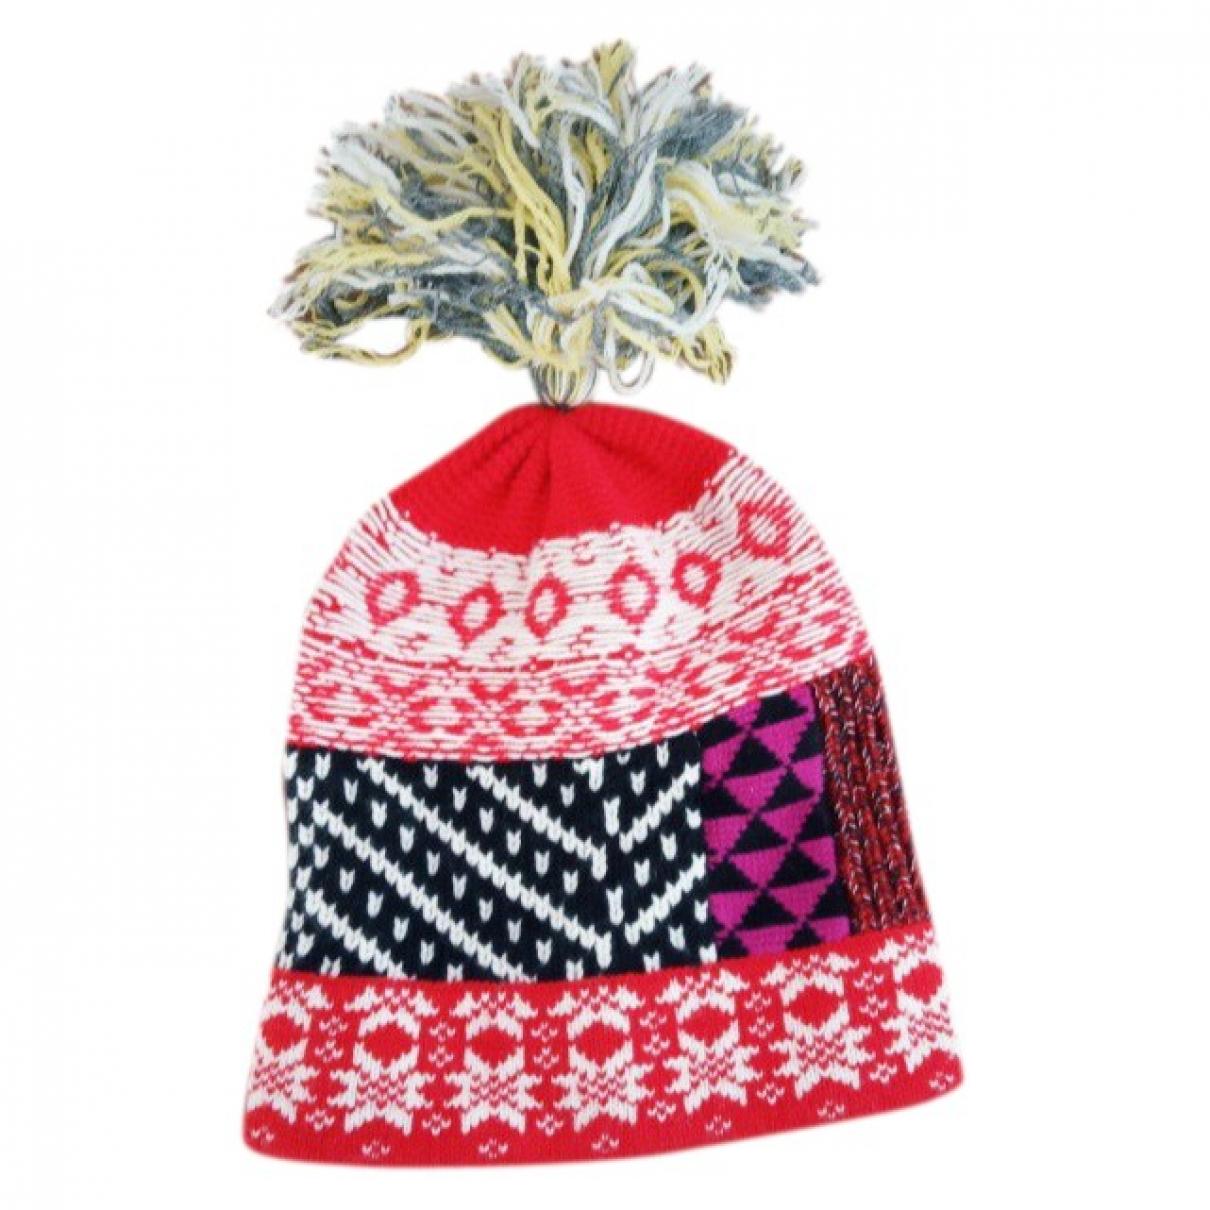 Burberry \N Multicolour Wool hat for Women M International